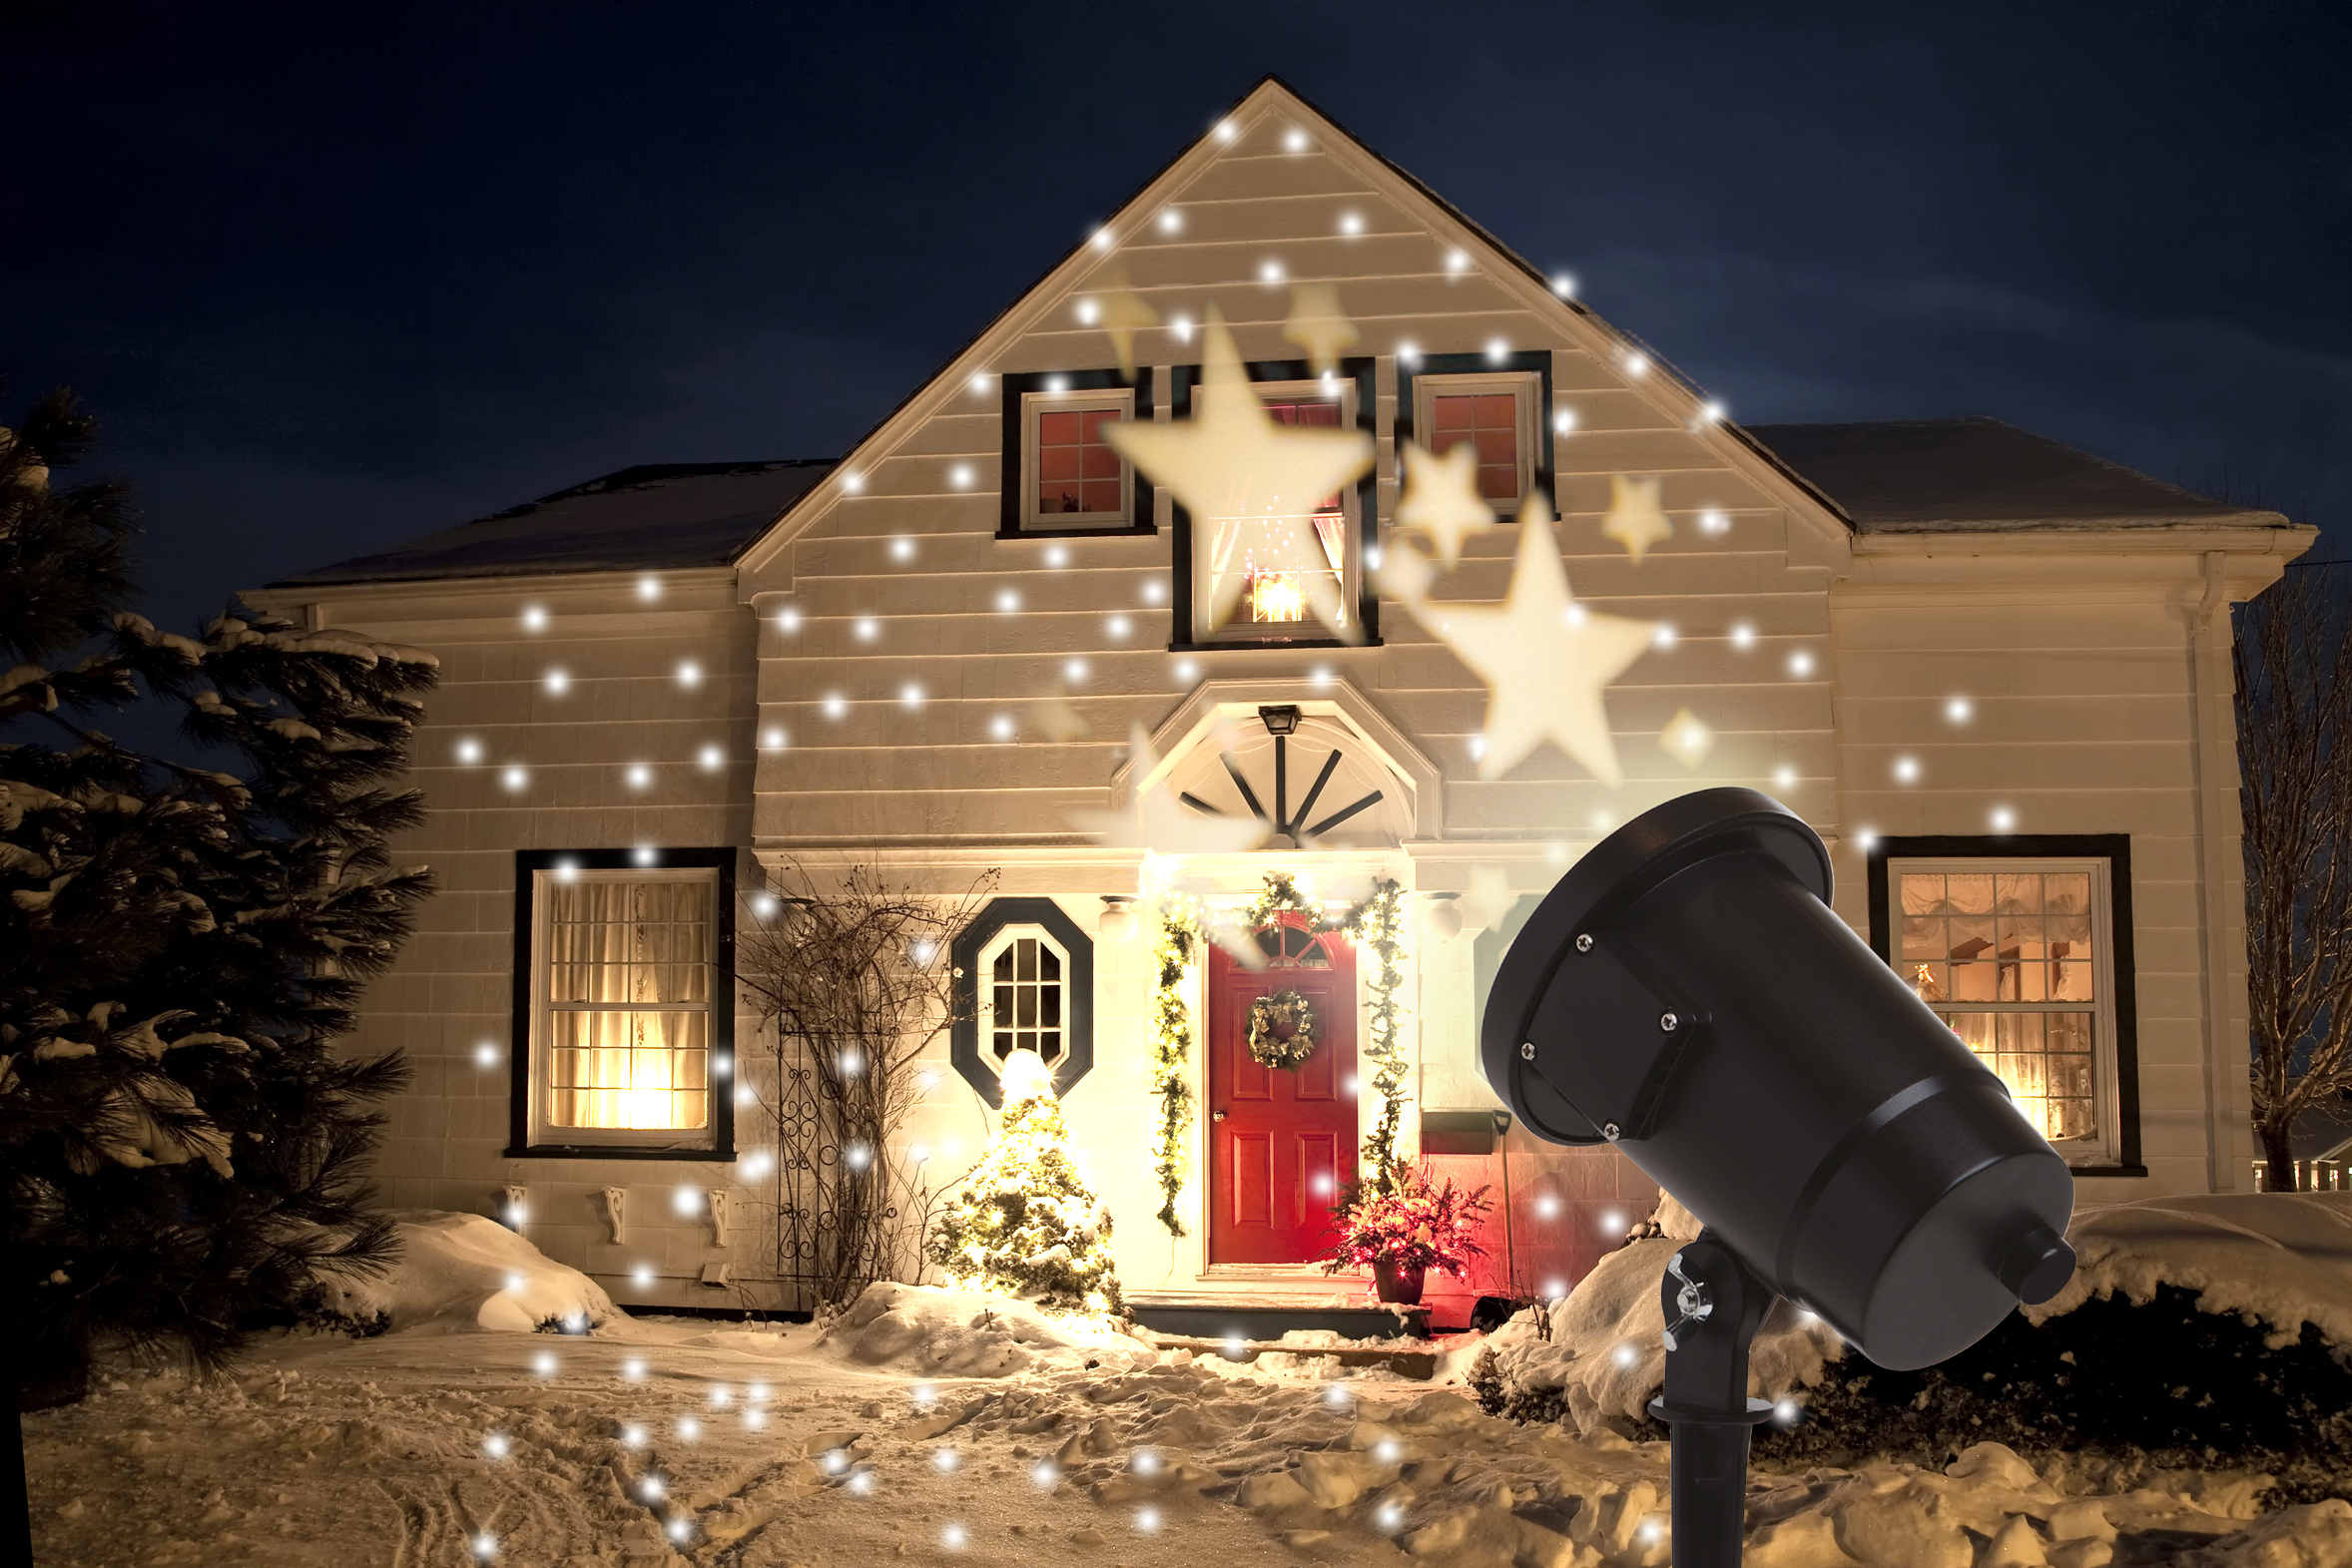 led projektor garten licht rotierende sterne warmwei. Black Bedroom Furniture Sets. Home Design Ideas